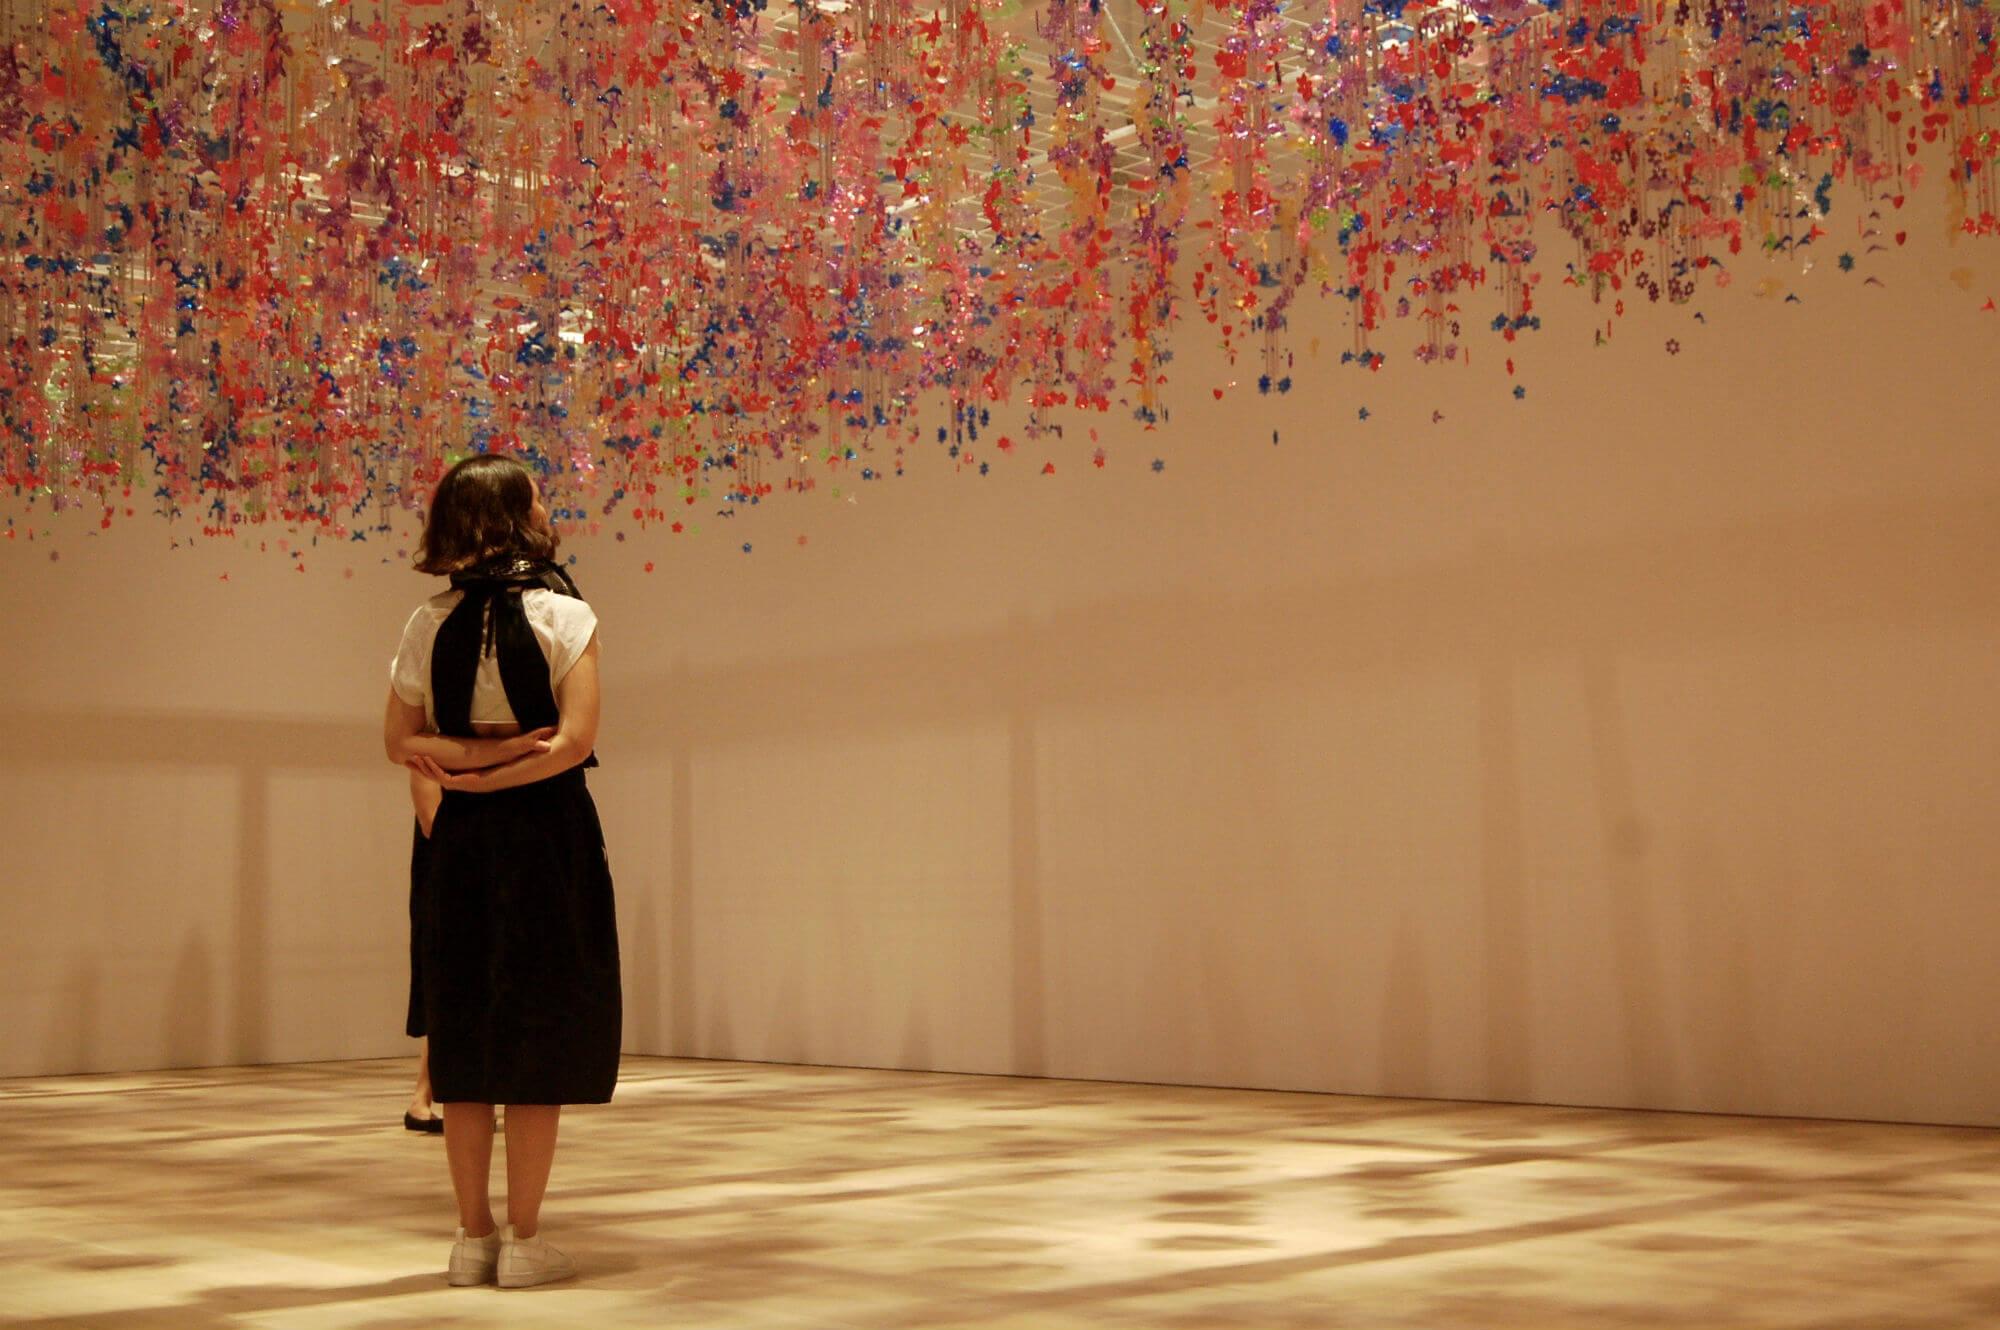 MORI ART VIAGGIO A TOKYO